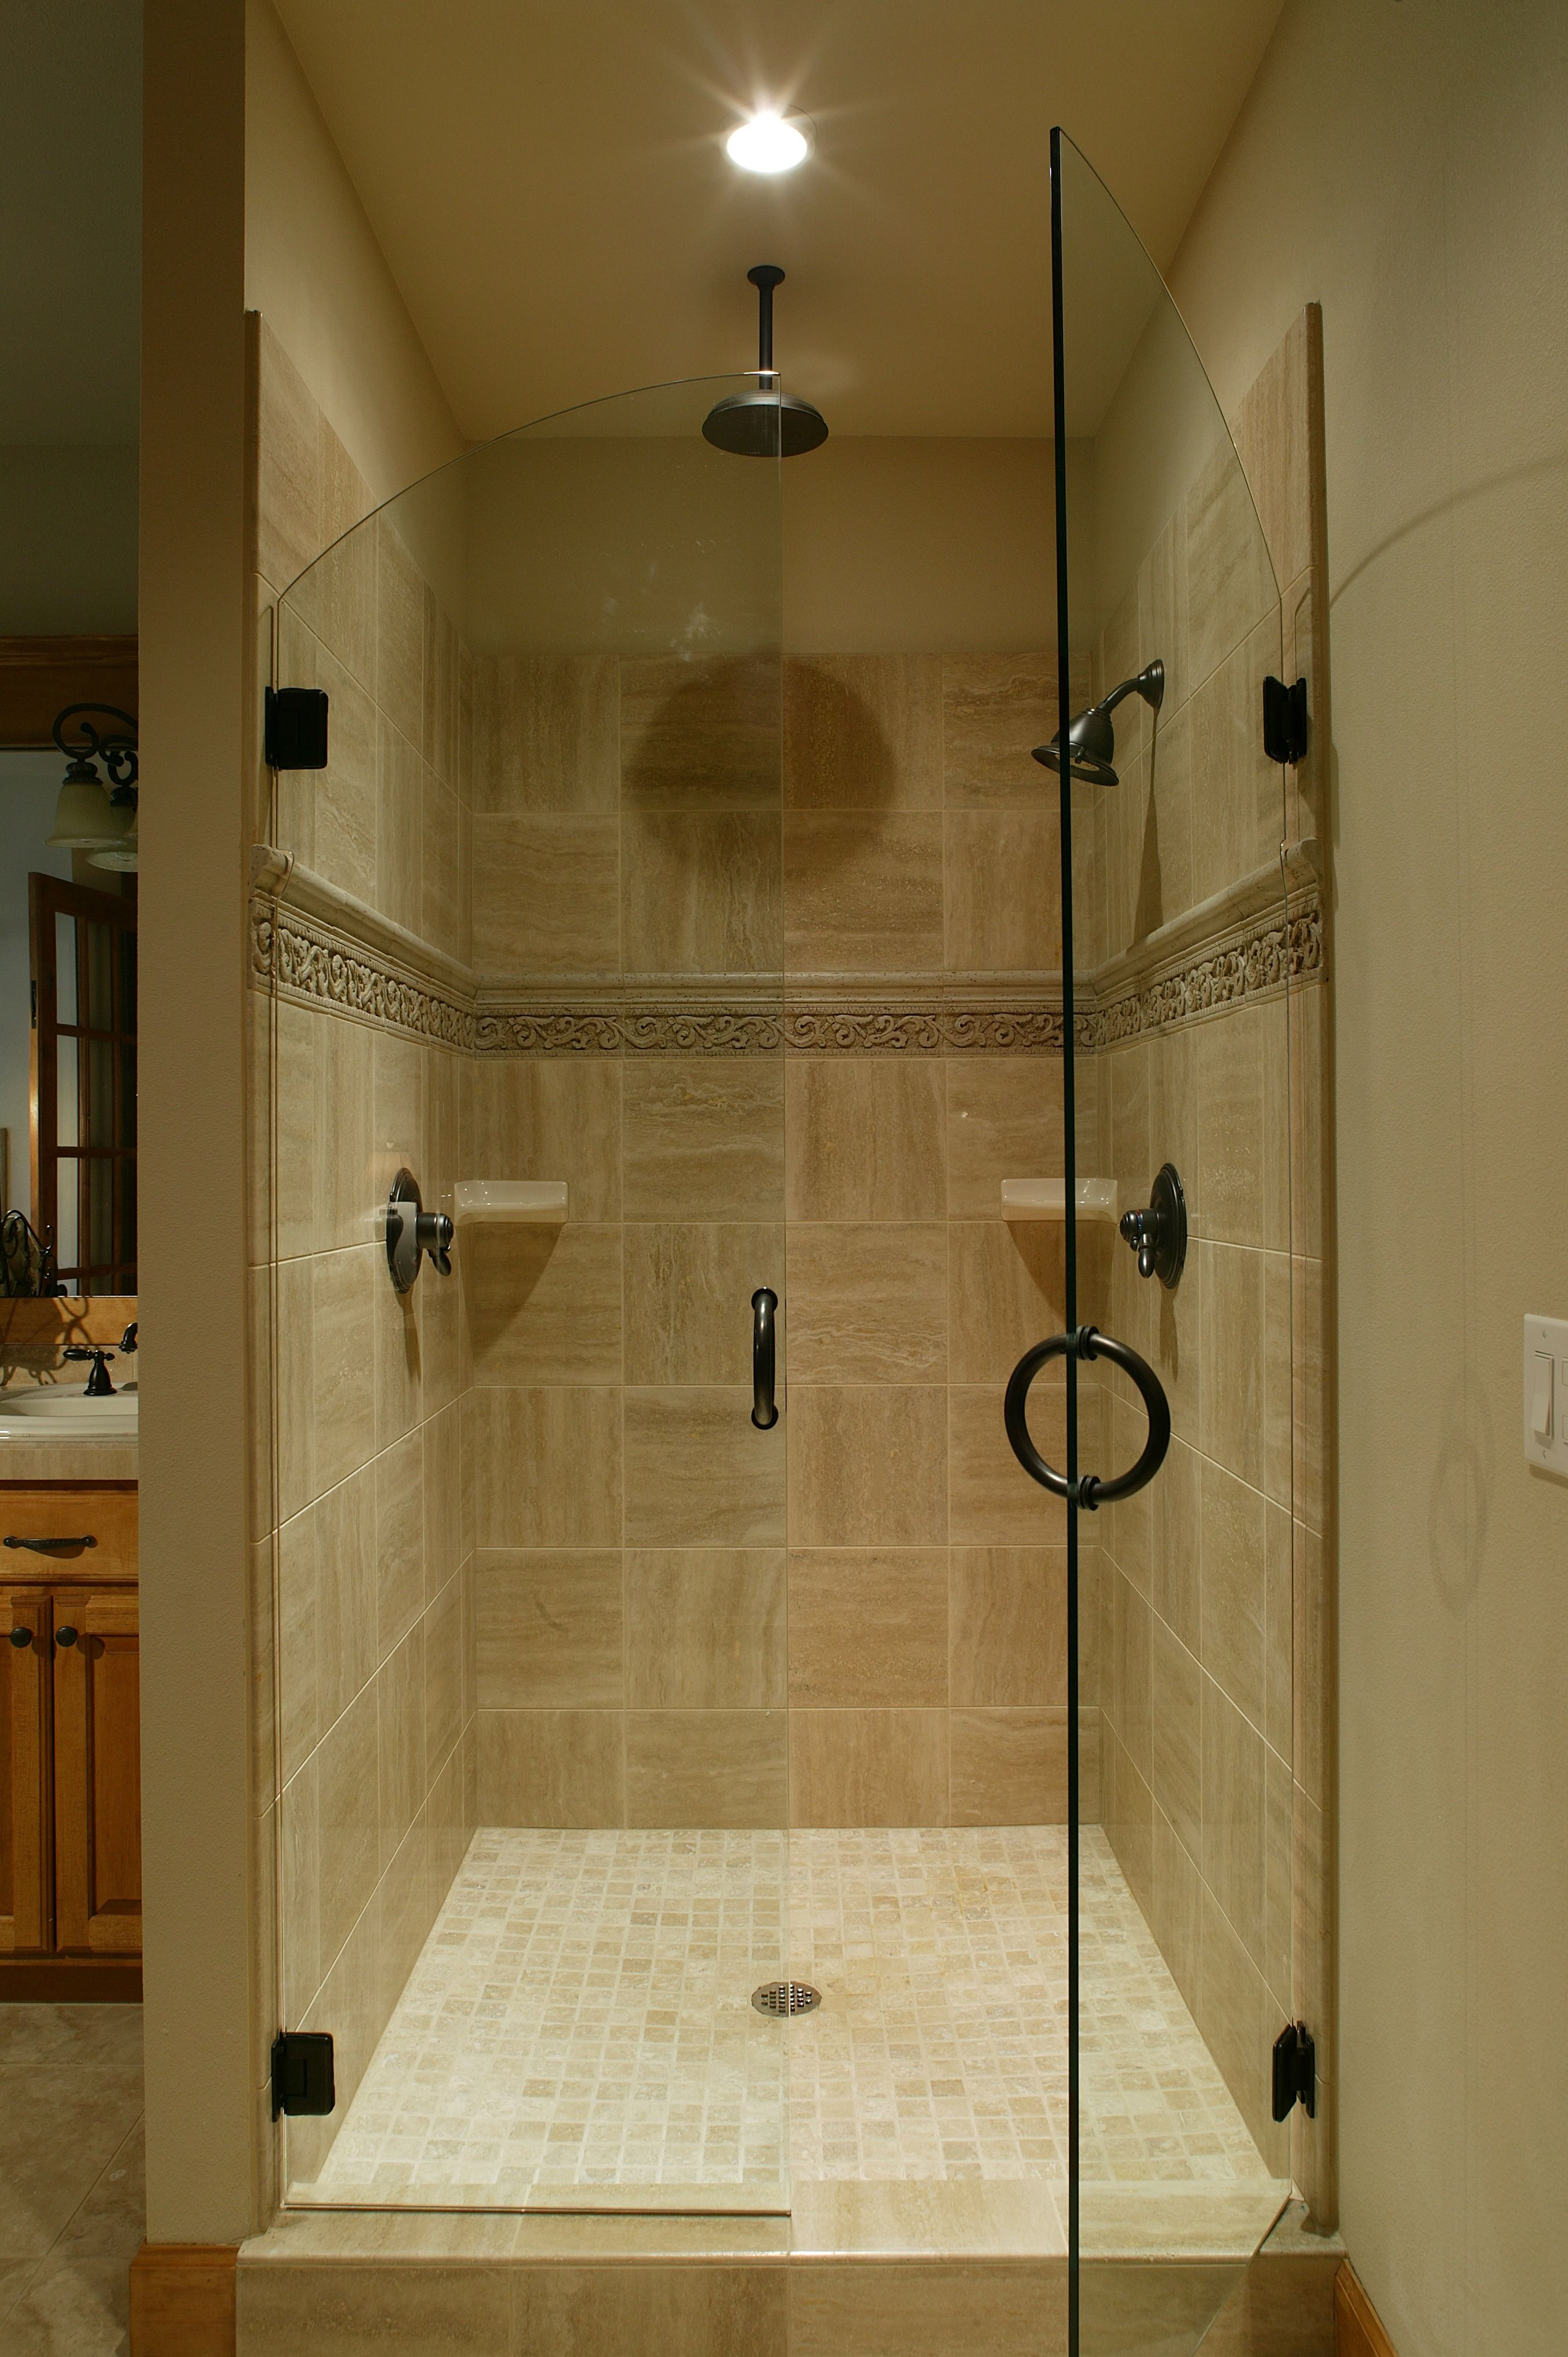 DIY Bathroom Remodel Planning   Diy bathroom remodel, Tile showers ...